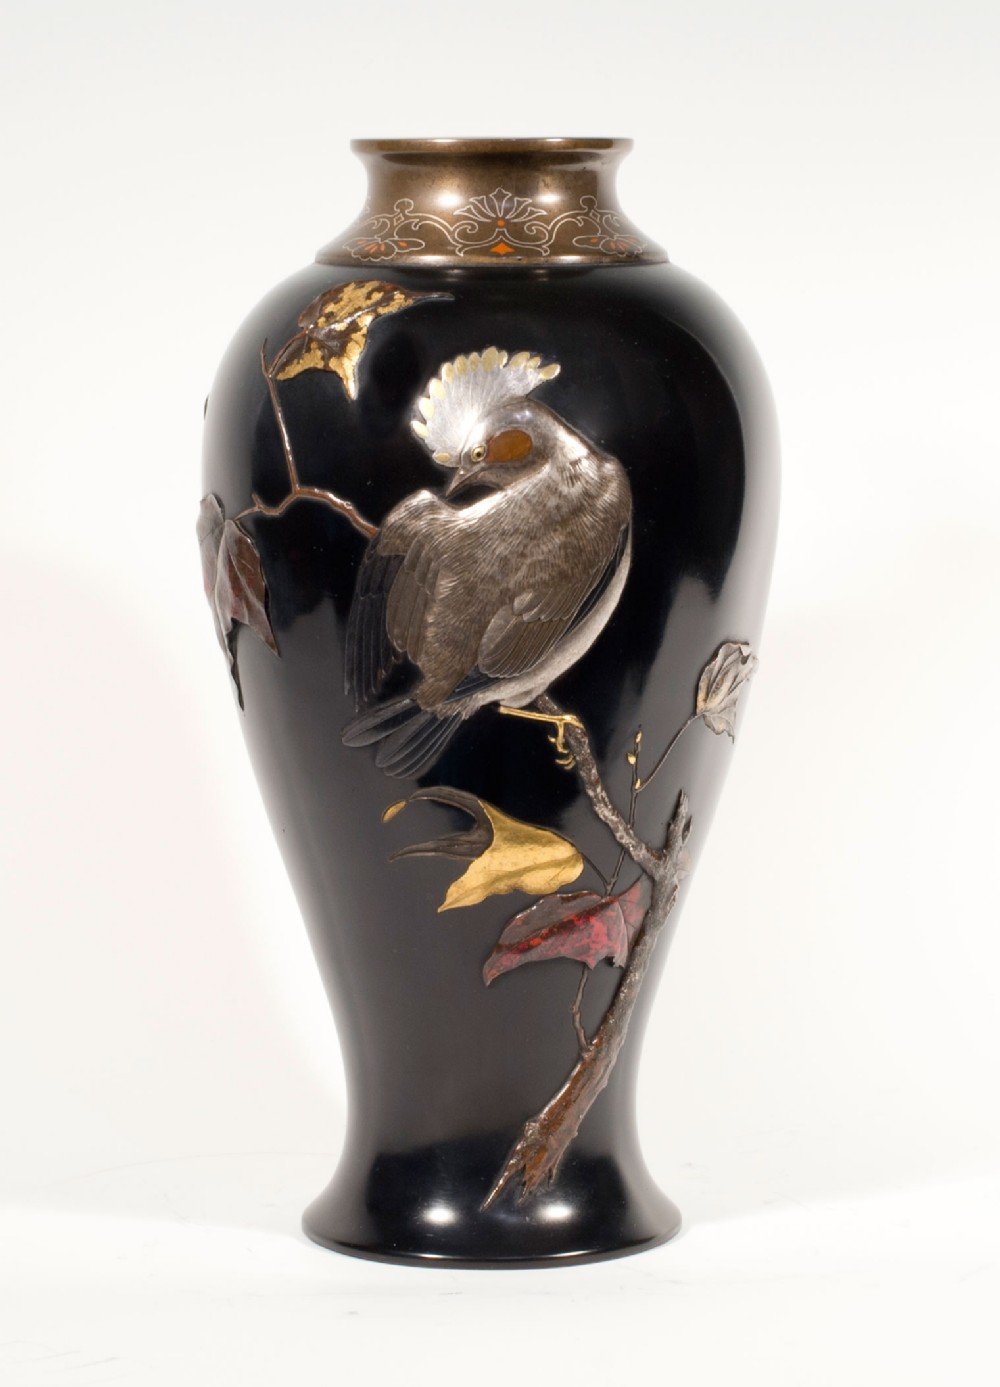 japanese mixed metal onlaid vase artist signed suzuki chokichi kako